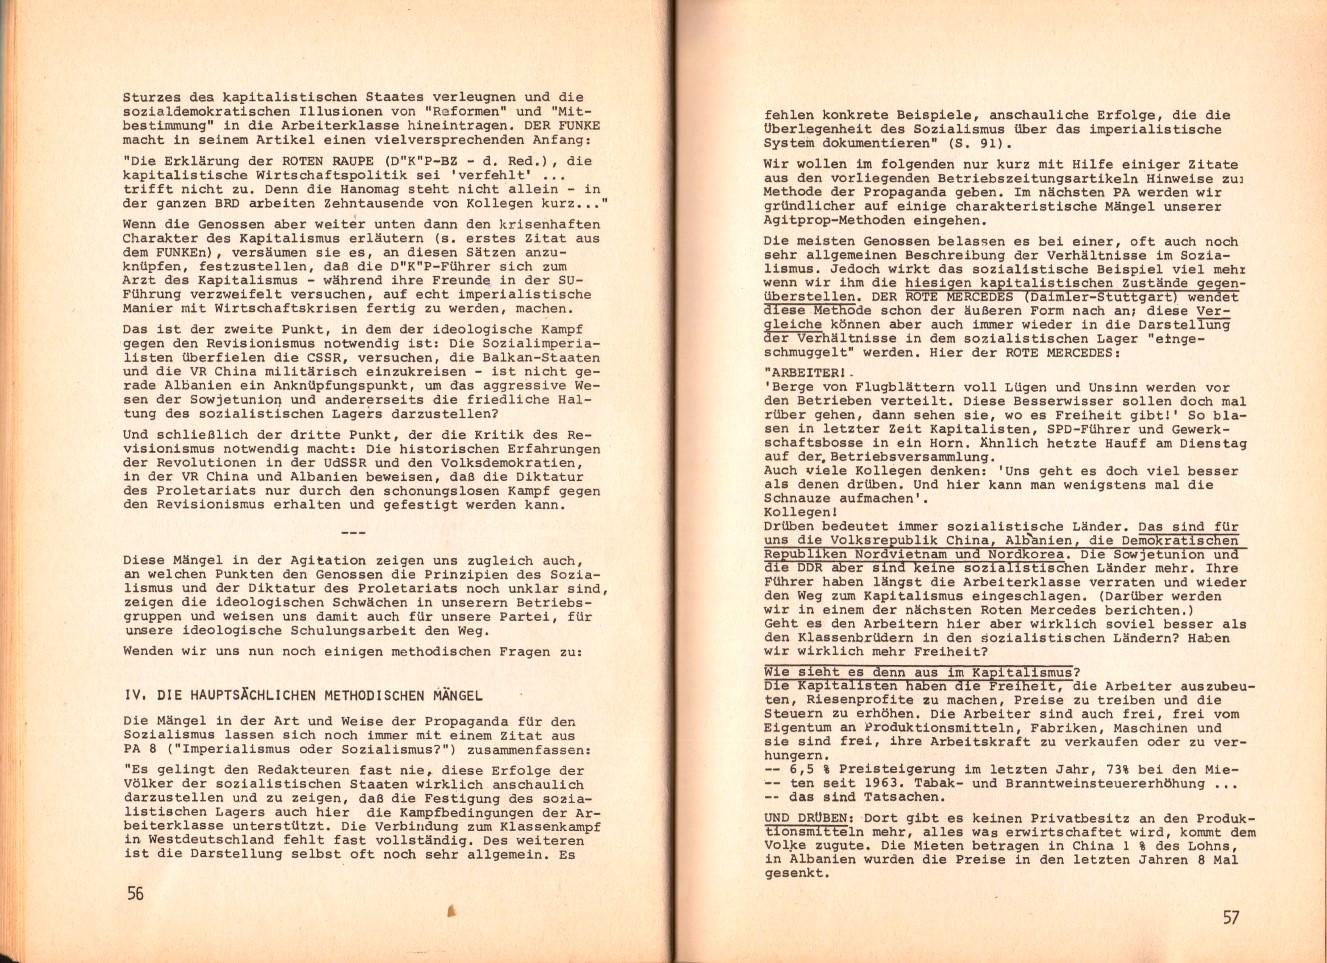 ZB_Parteiarbeiter_1971_10_30